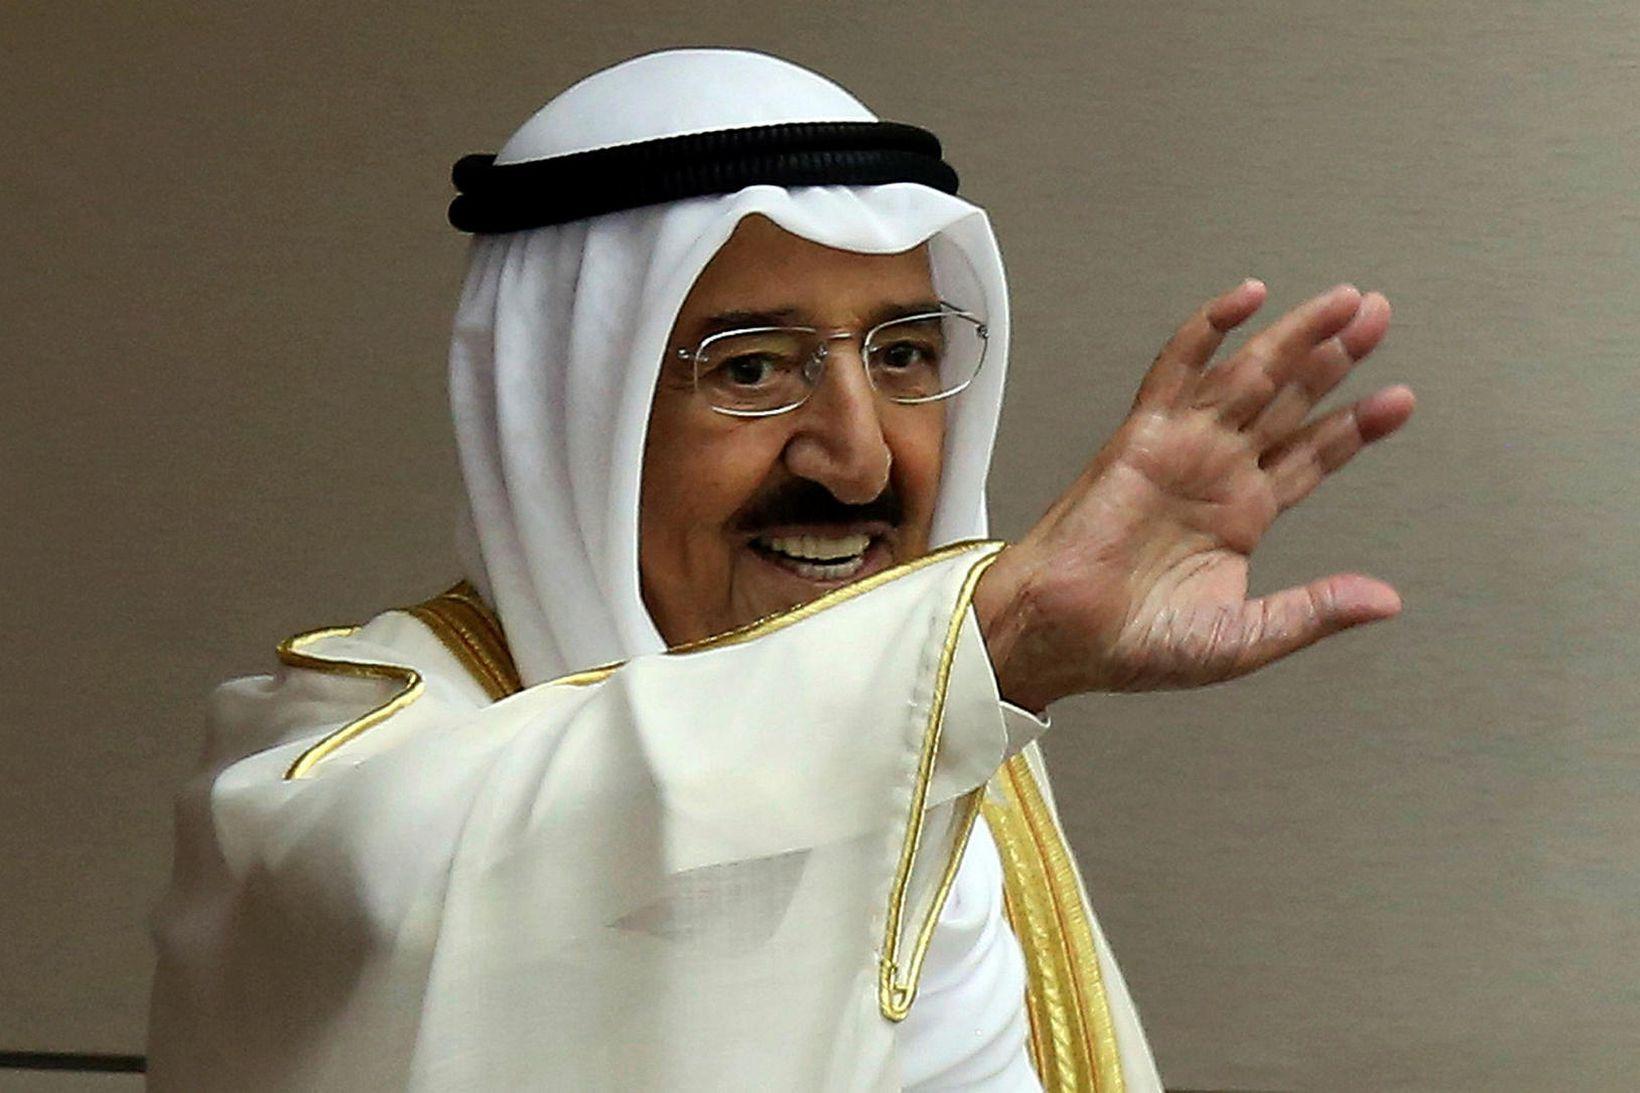 Sjeik Sabah al-Ahmad al-Sabah.